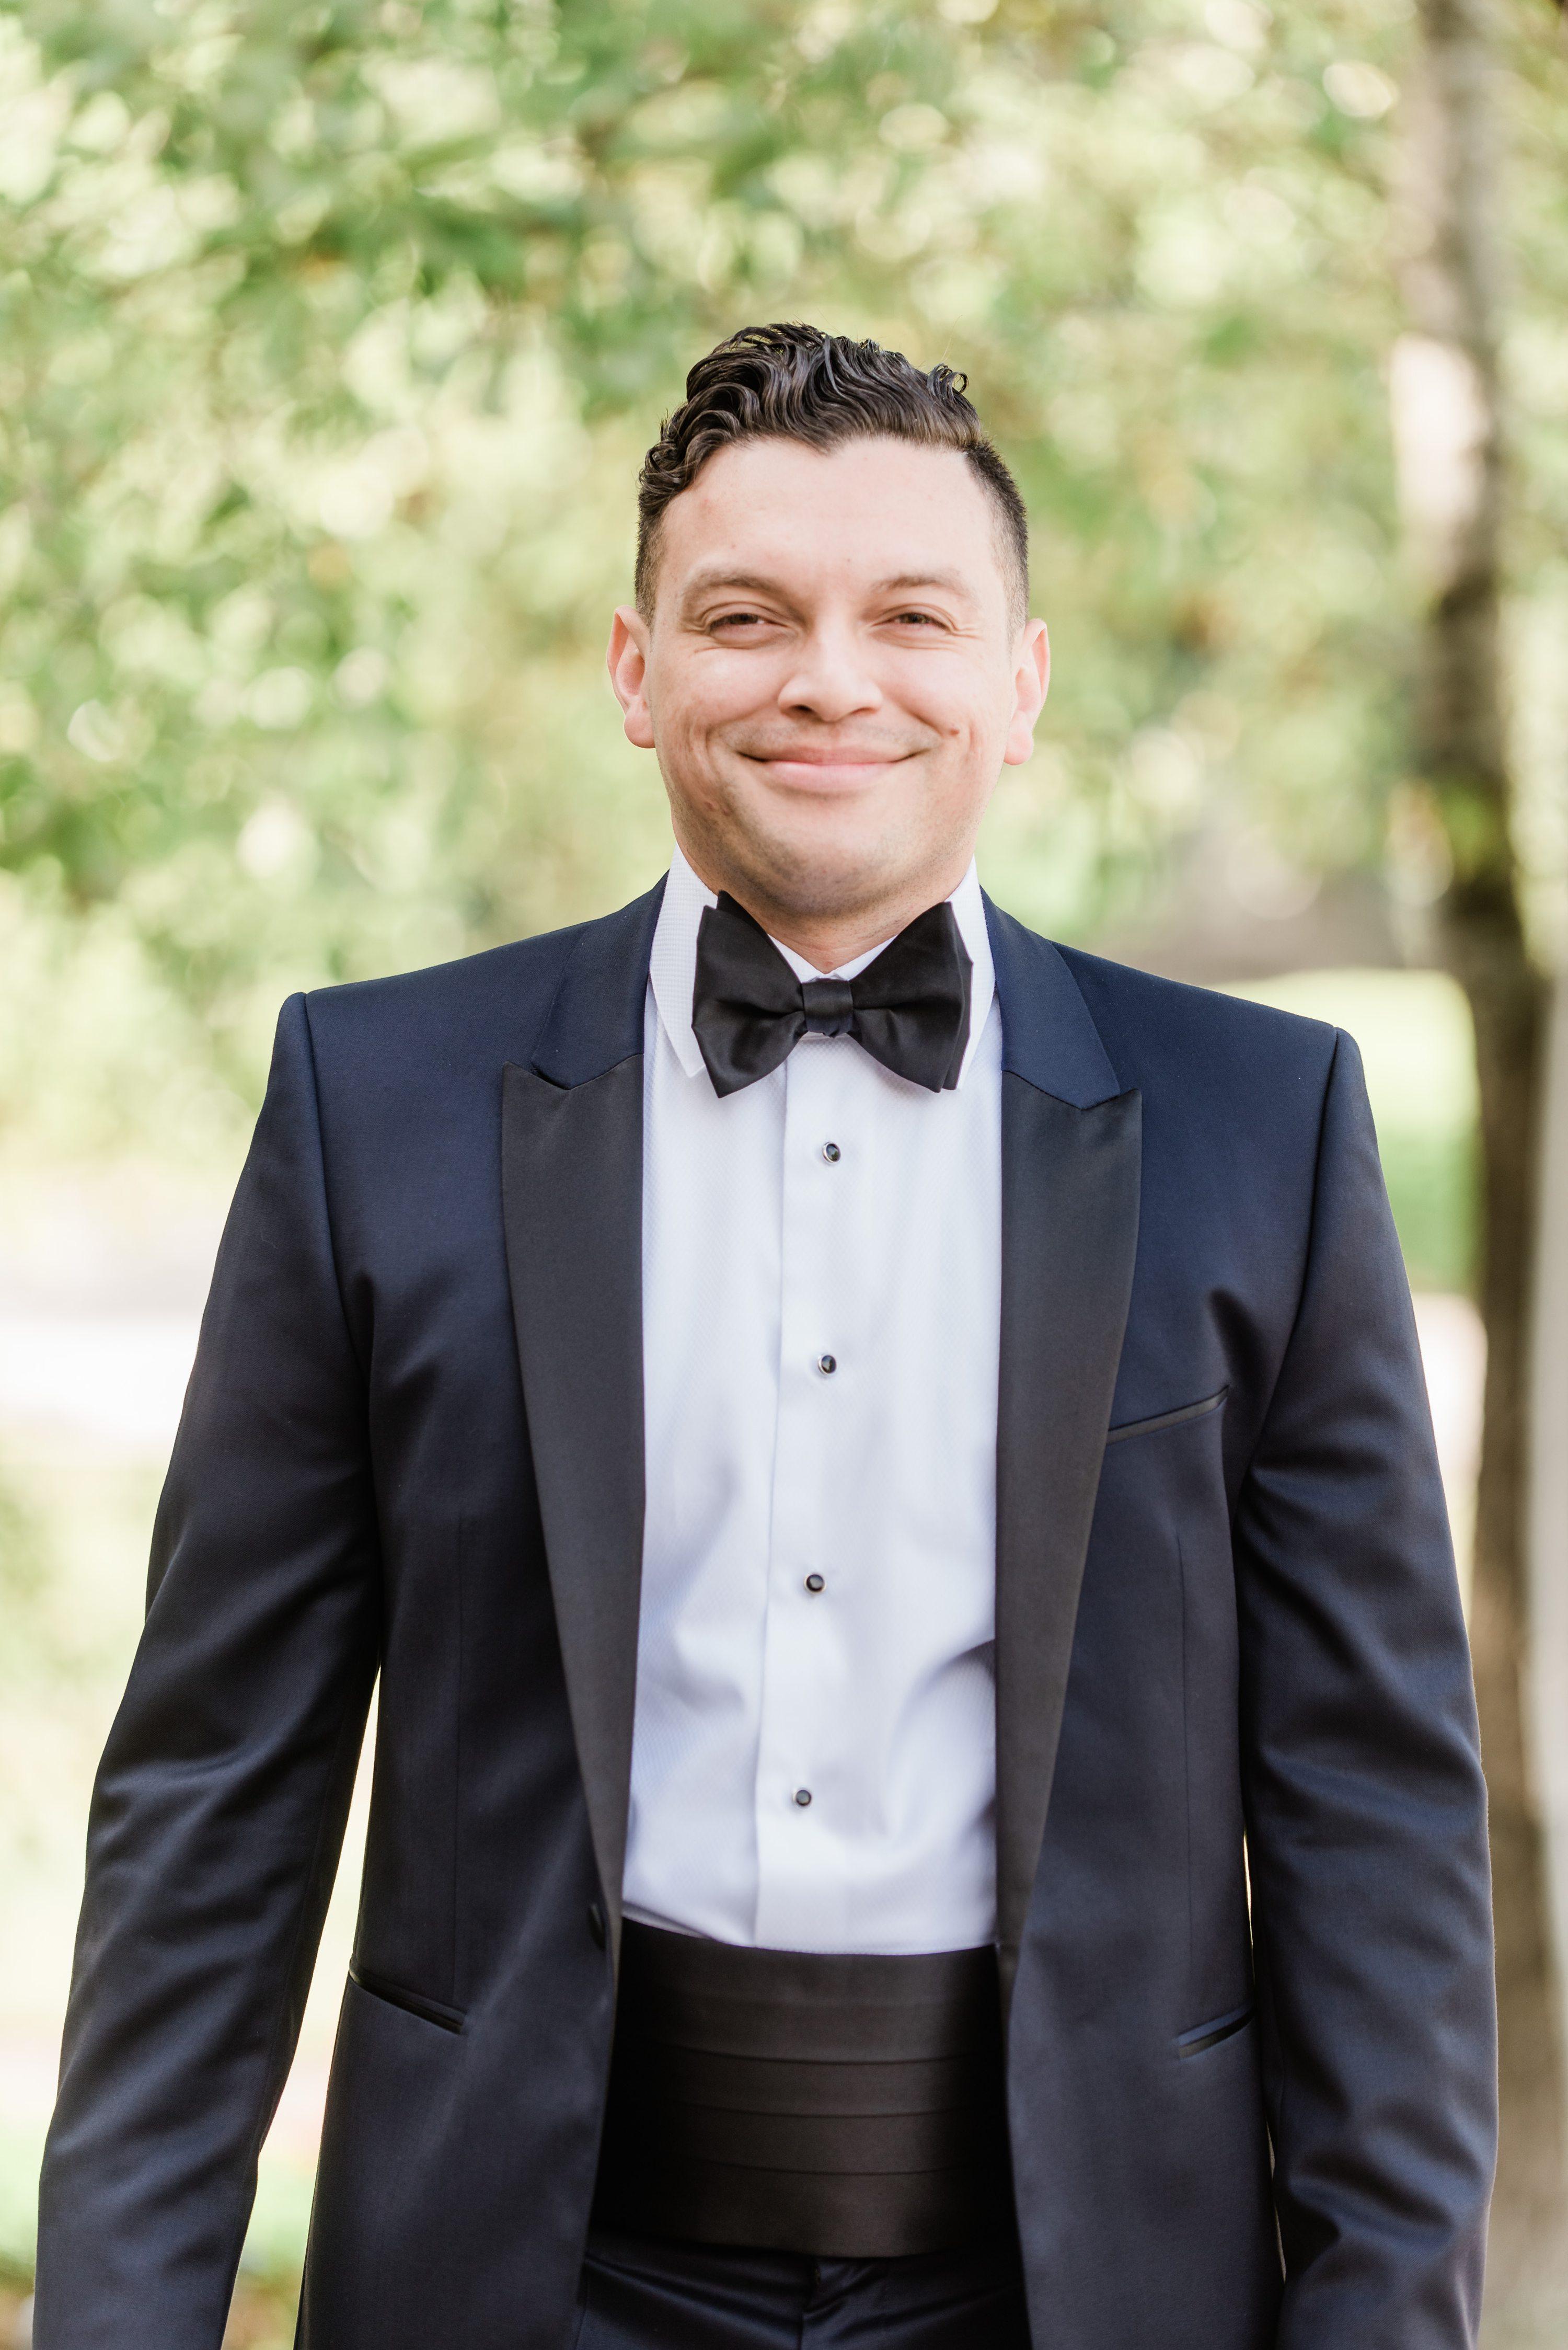 Houston Wedding Photography,Houston Wedding Photographer